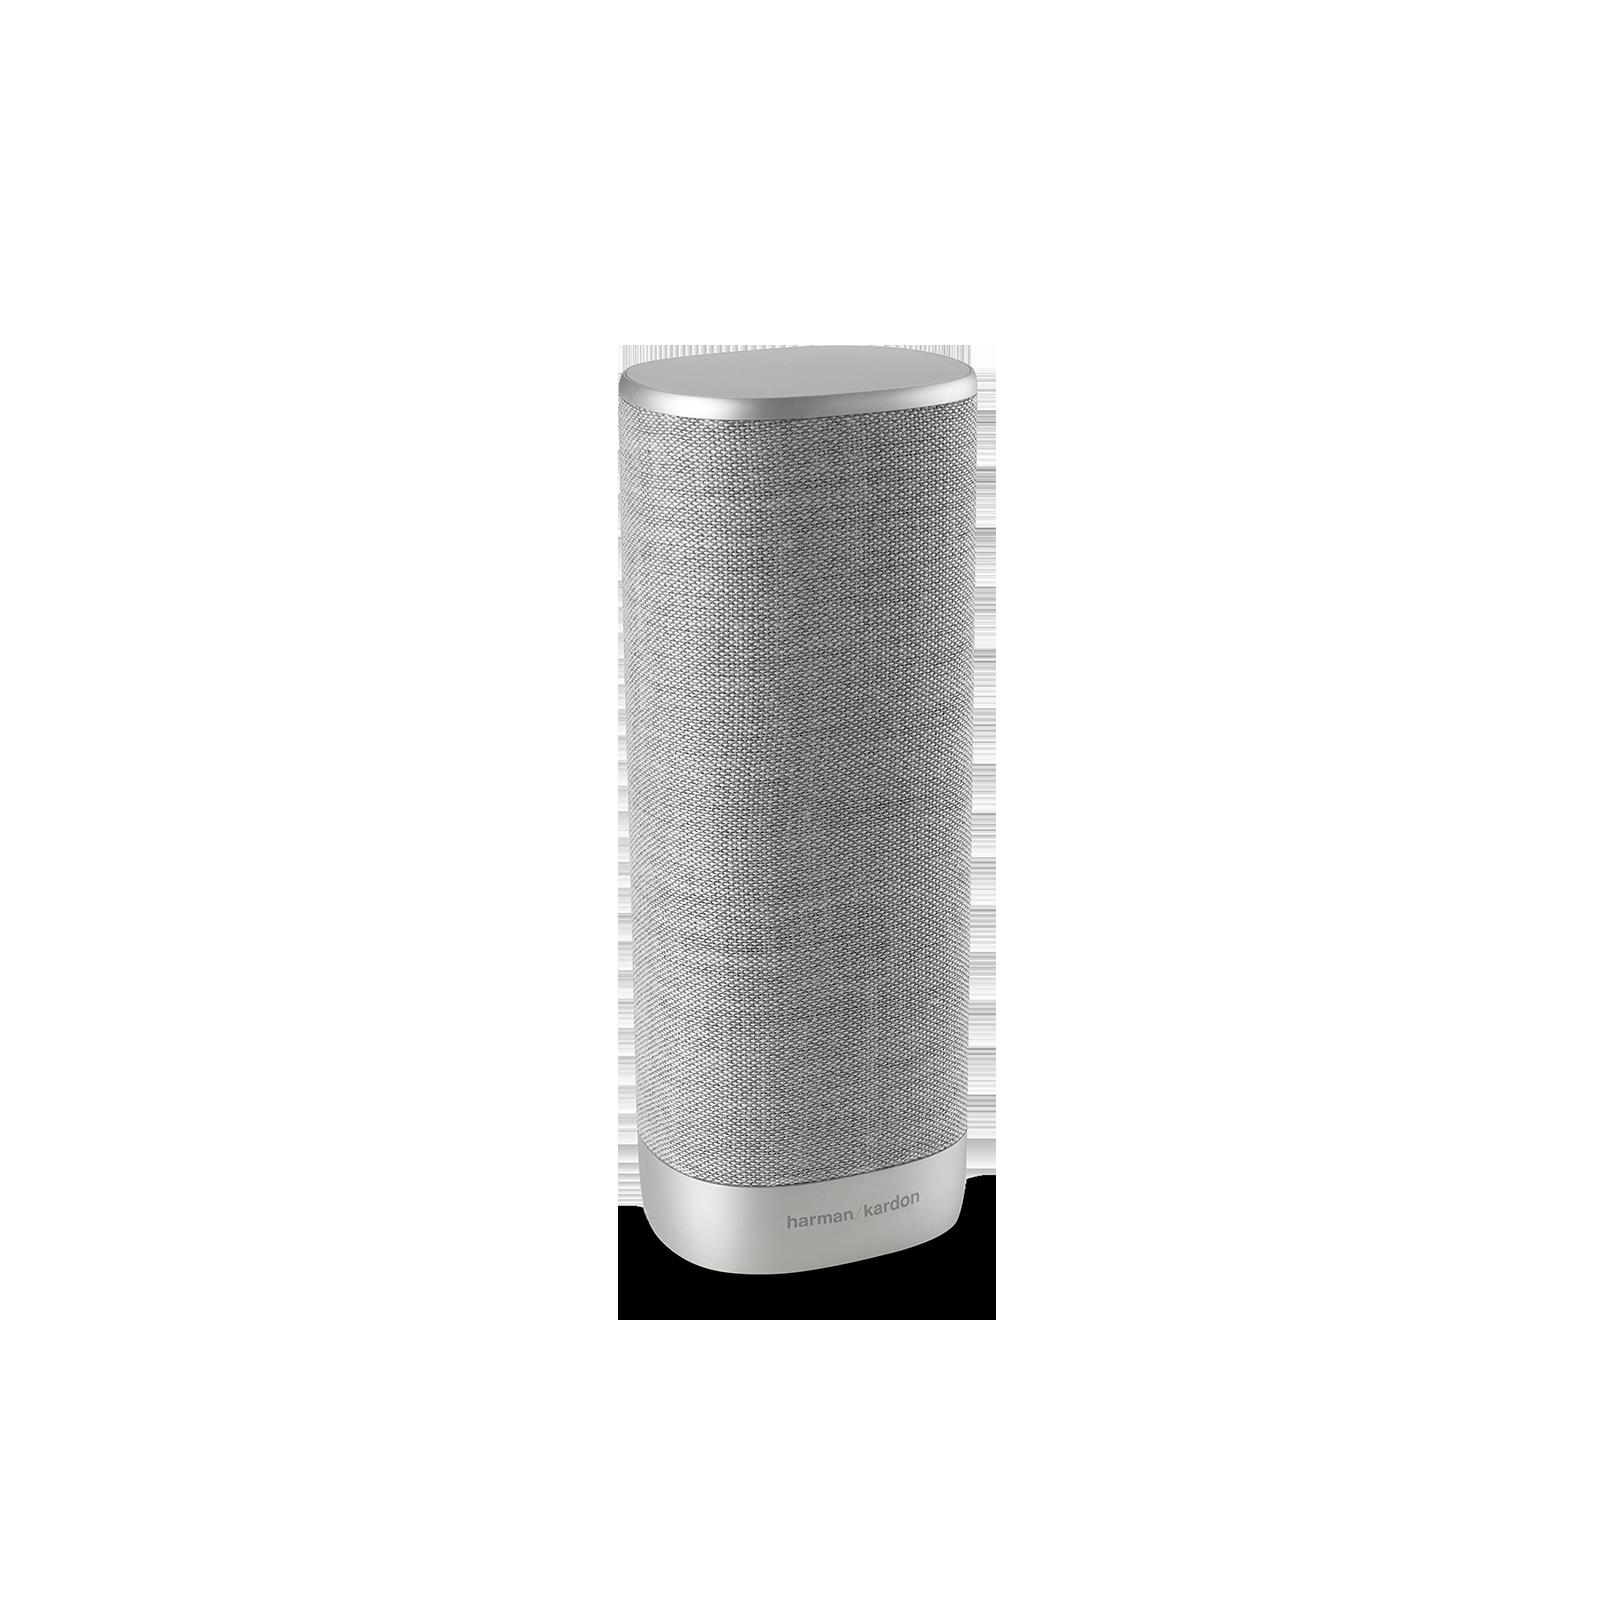 Harman Kardon Citation Surround - Grey - Surround sound for immersive movie experience - Left